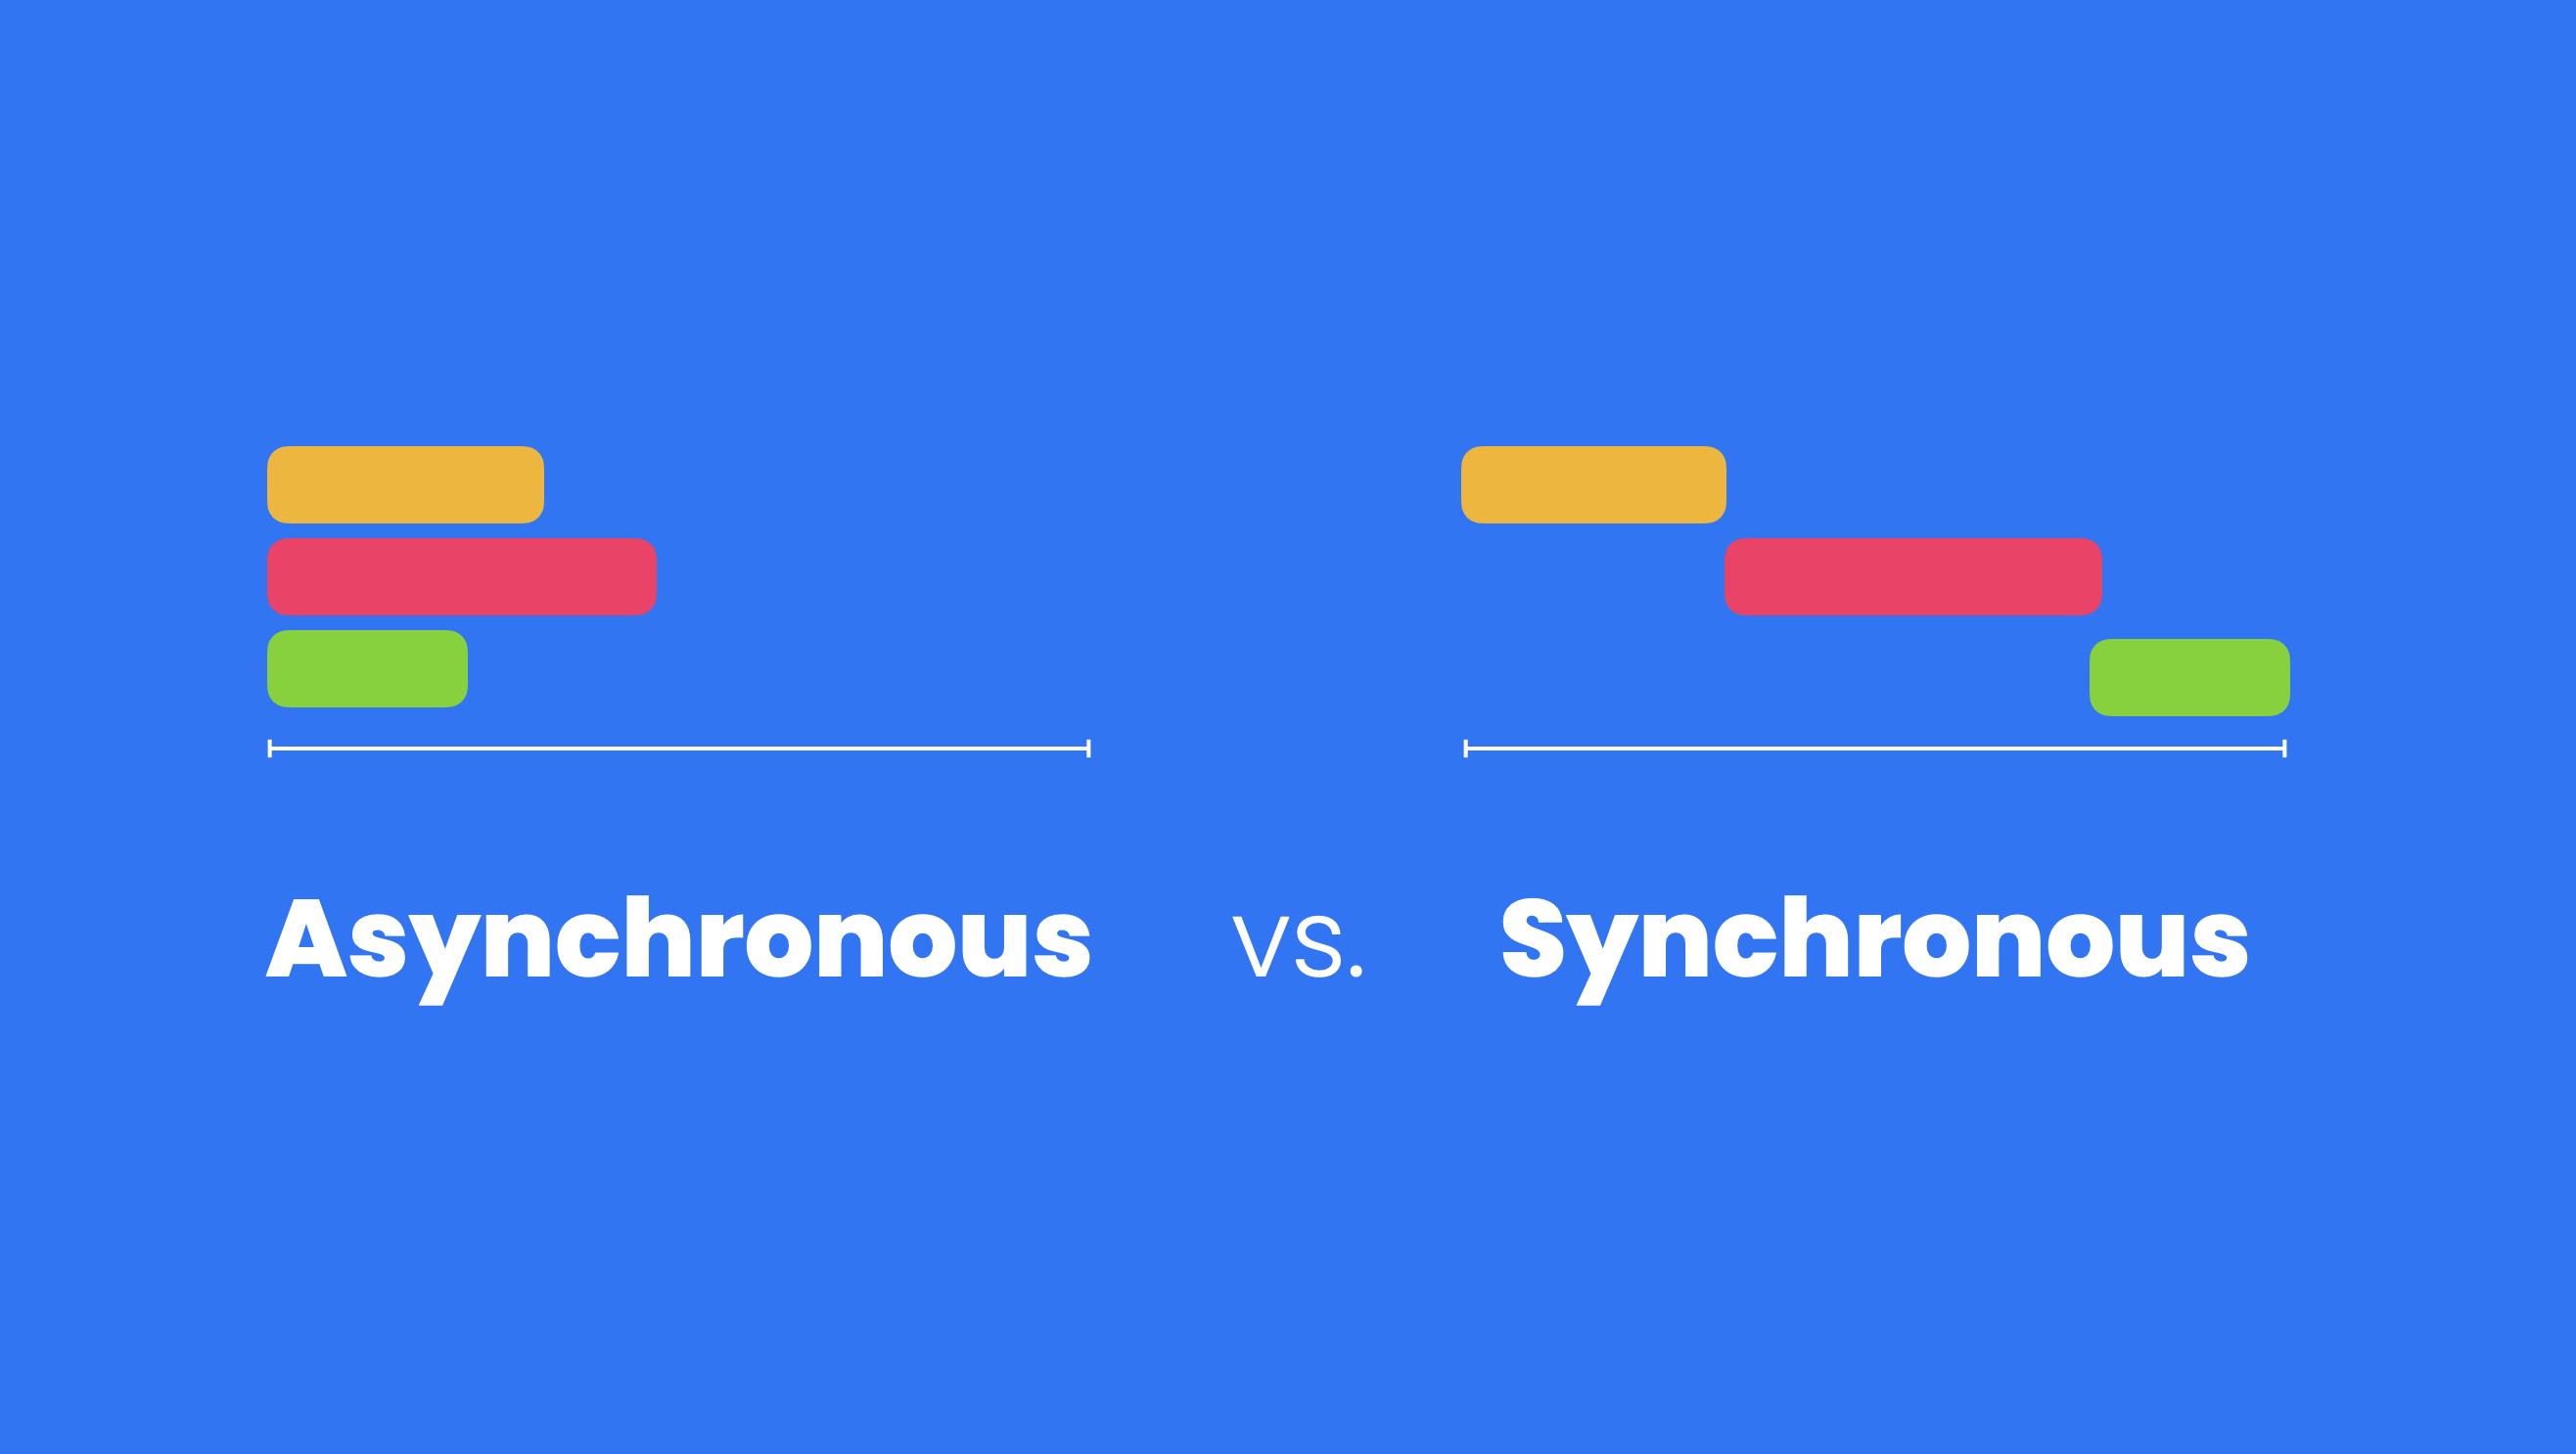 Asynchronous vs. Synchronous video